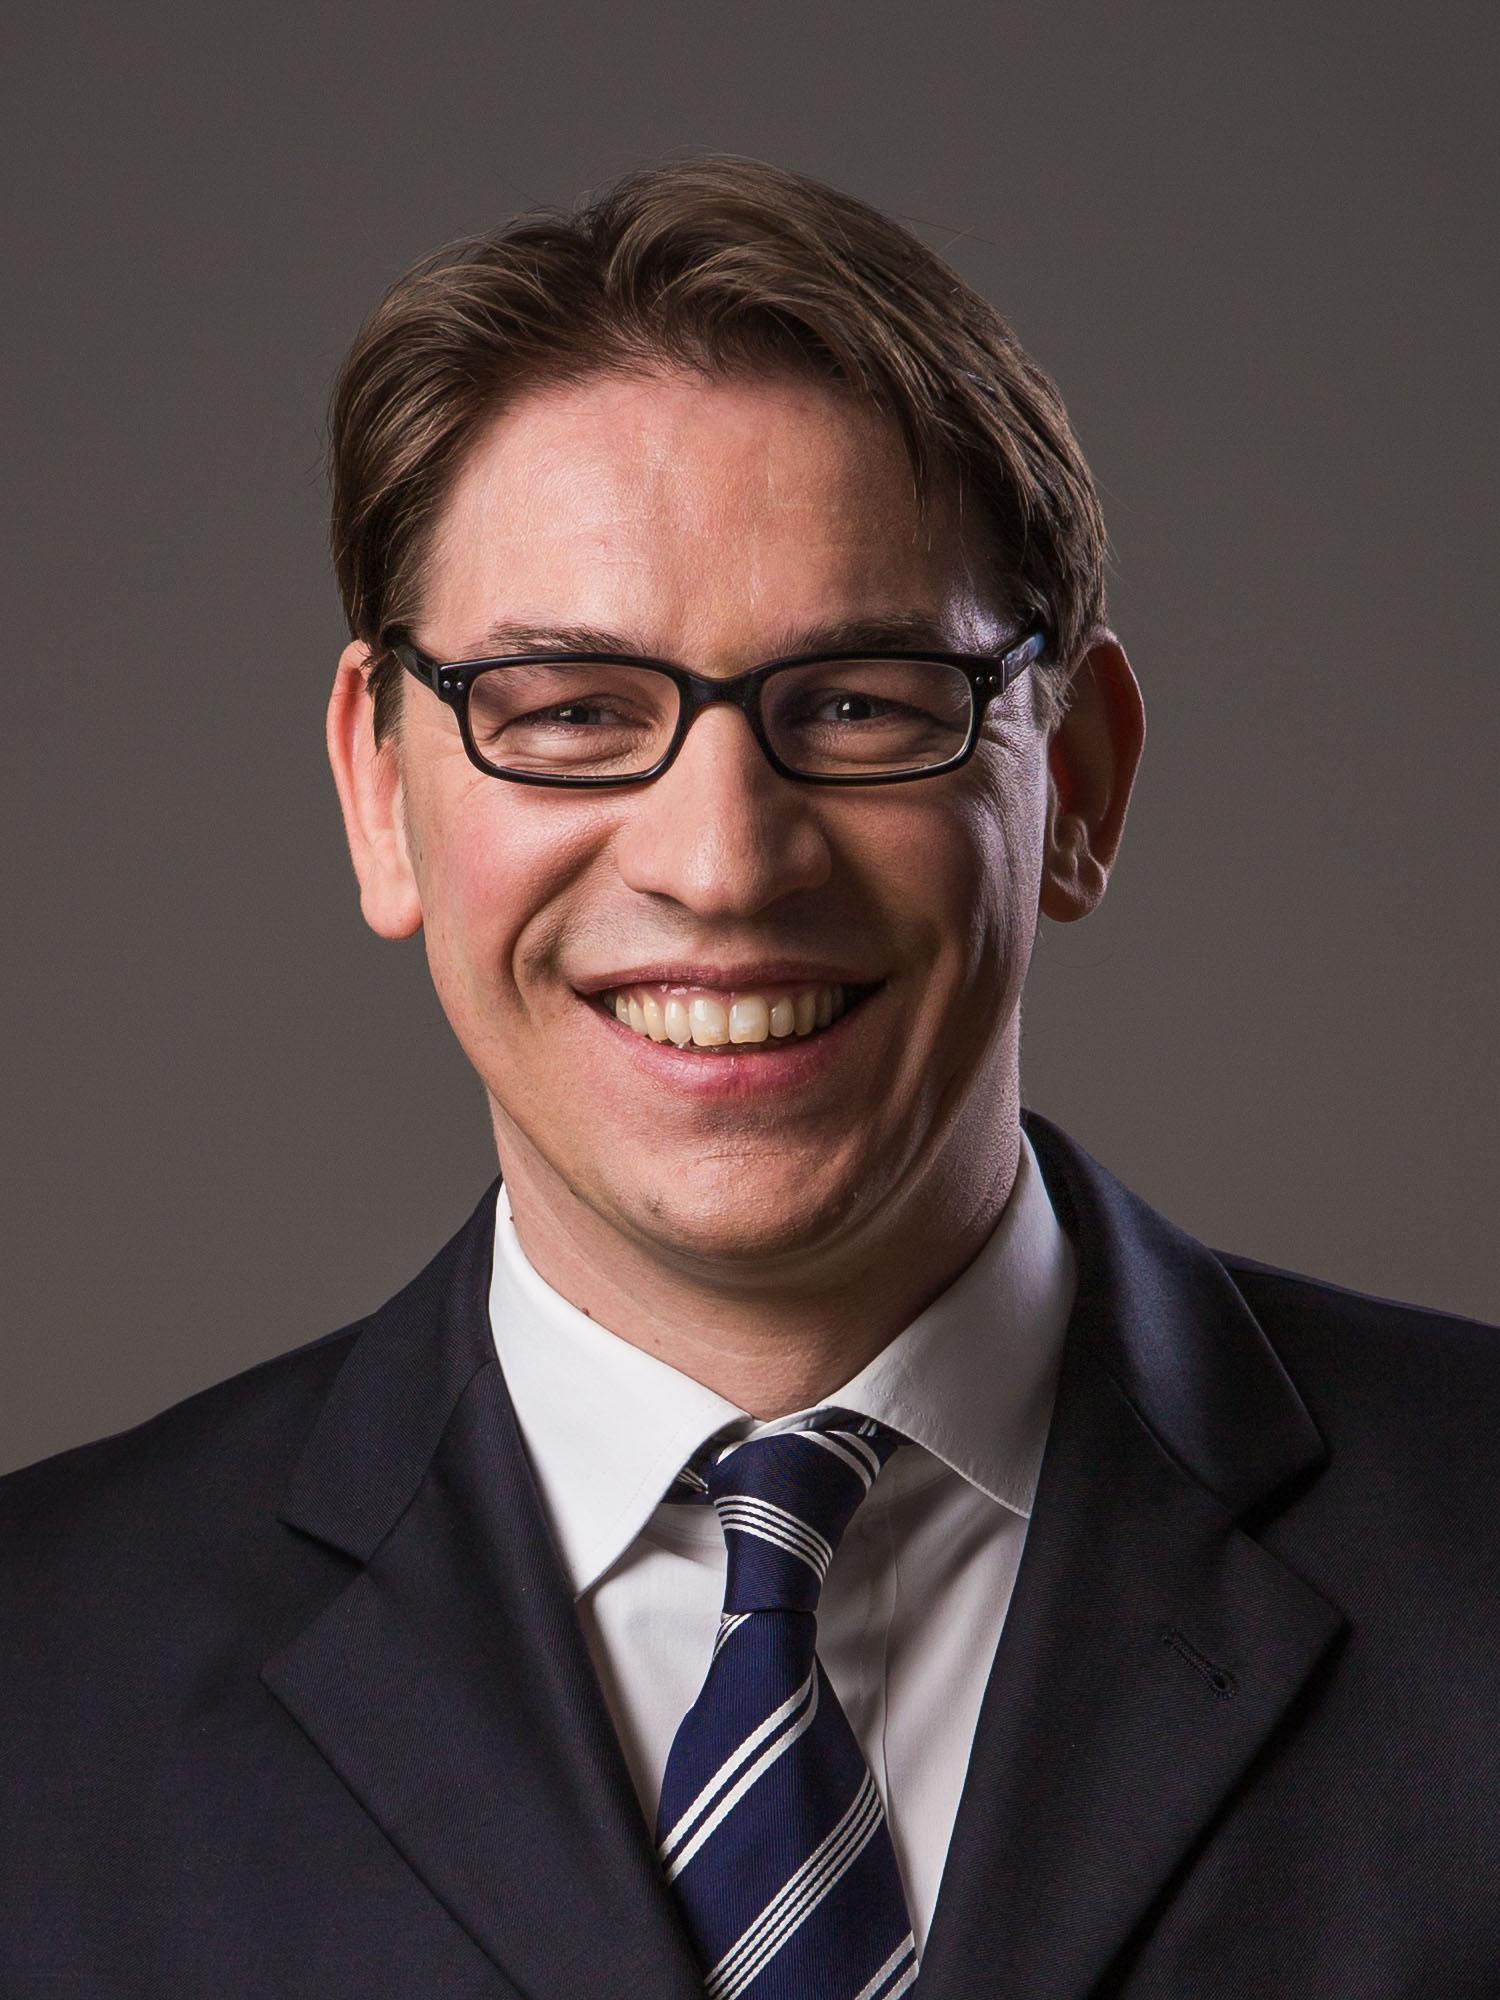 Maximilian Görwitz, Geschäftsführer Horn & Görwitz GmbH & Co. KG